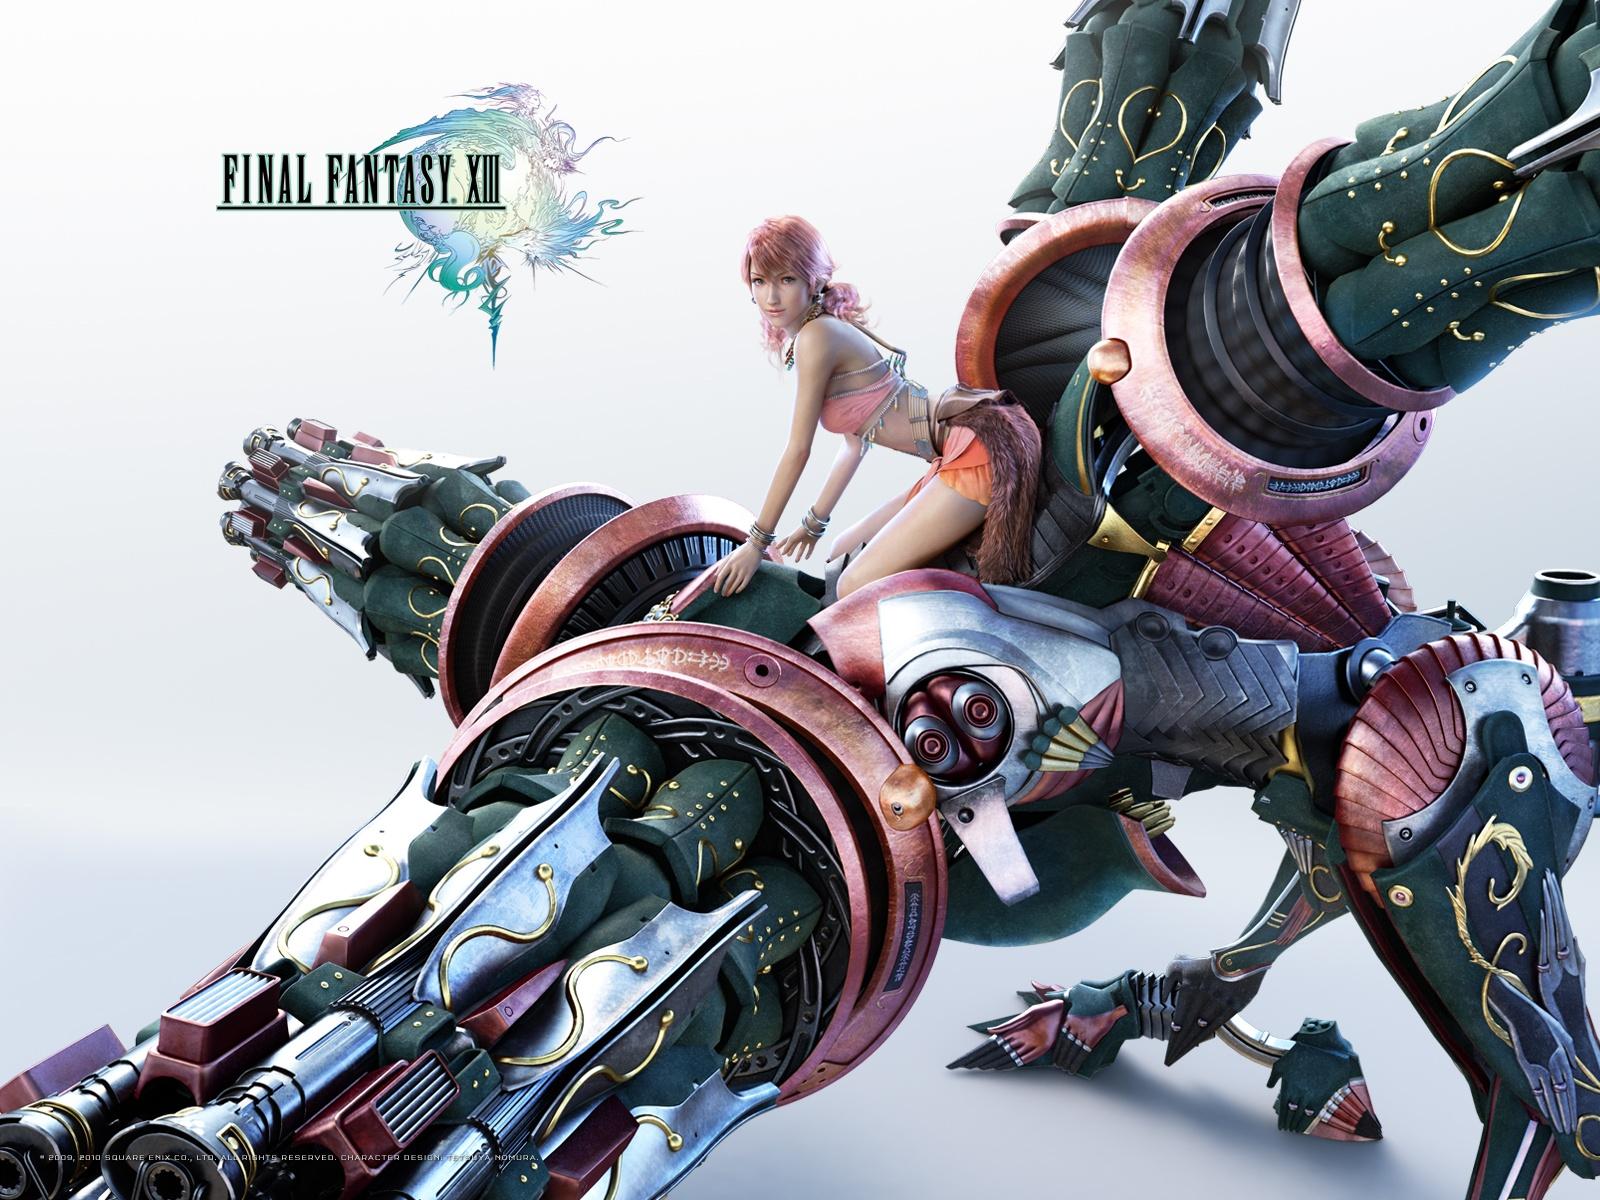 Final Fantasy Xiii Wallpaper: Wallpaper: Wallpaper Final Fantasy Xiii